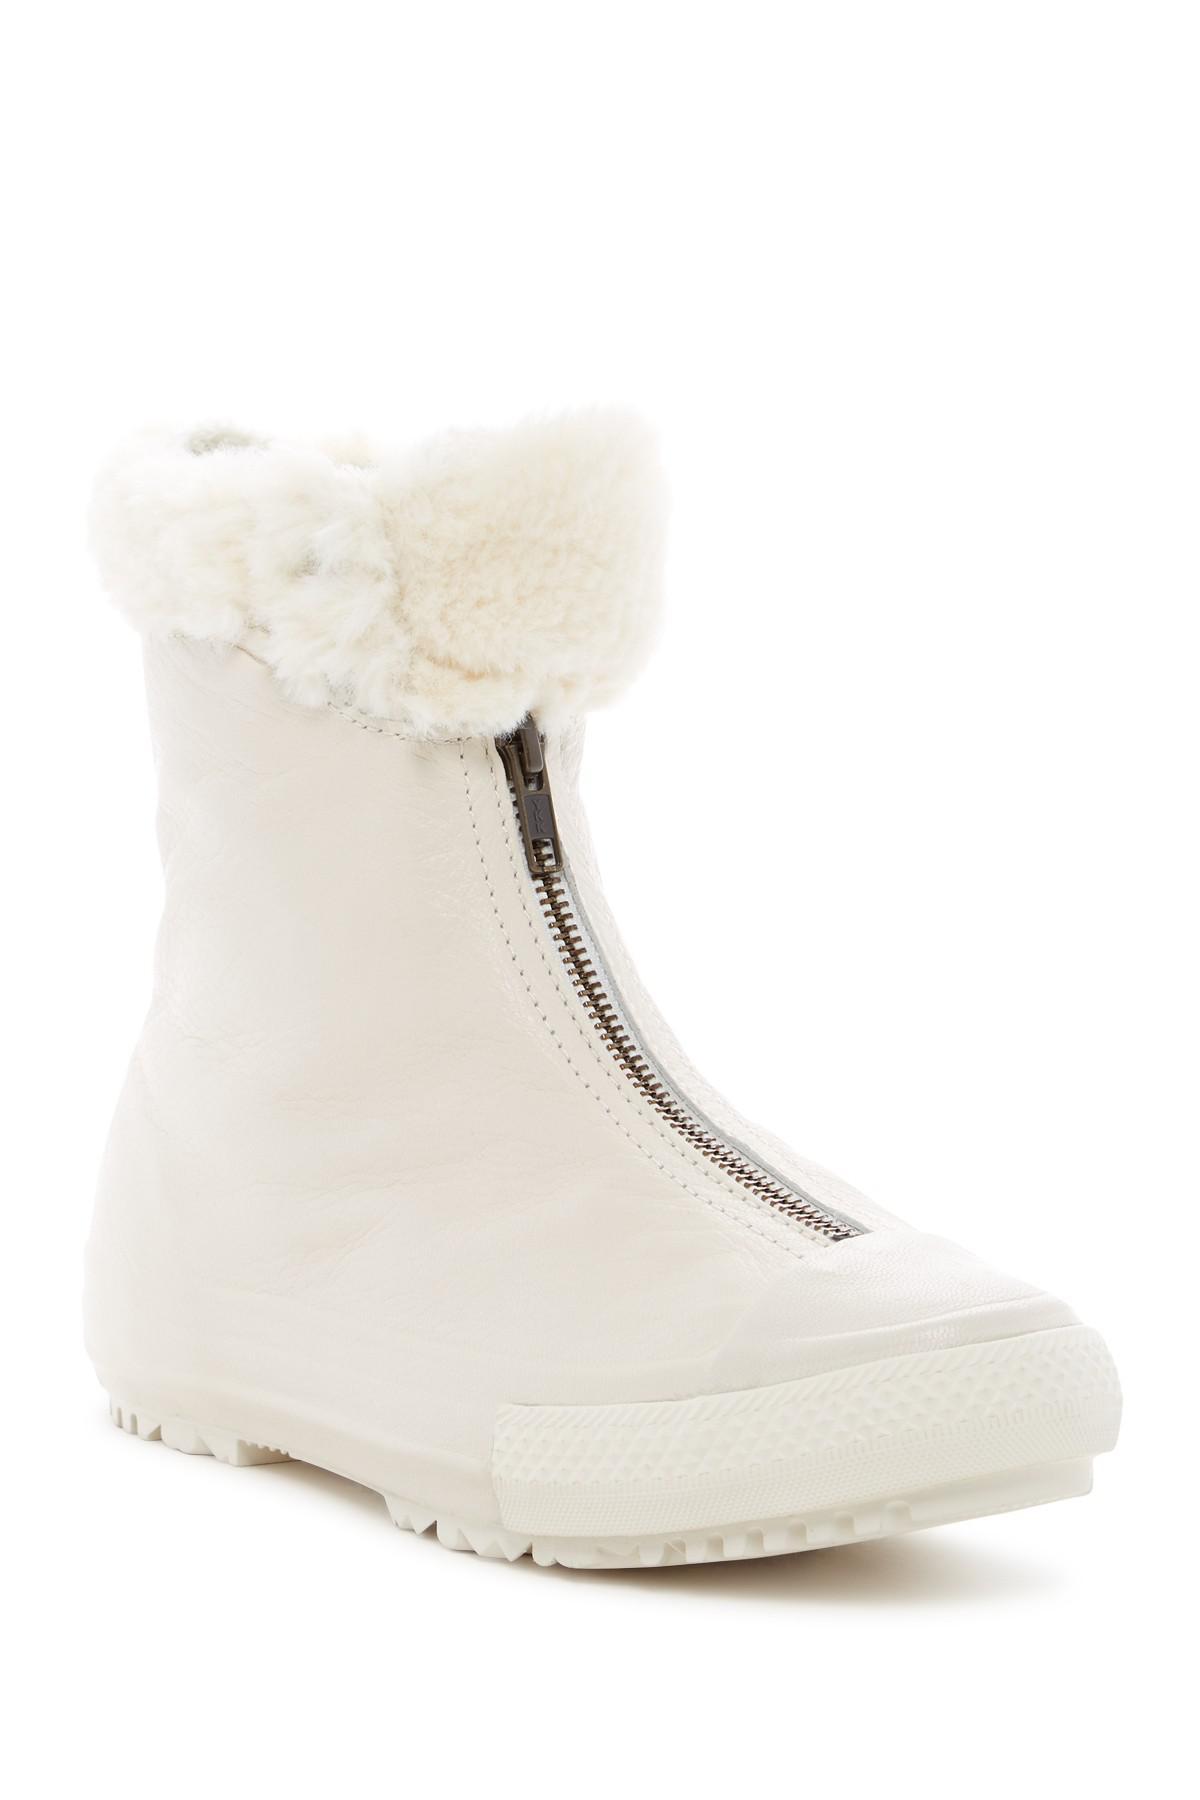 9d3d46e4993 Lyst - Converse Chuck Taylor All Star Shroud Faux Fur Lined Boot (women)